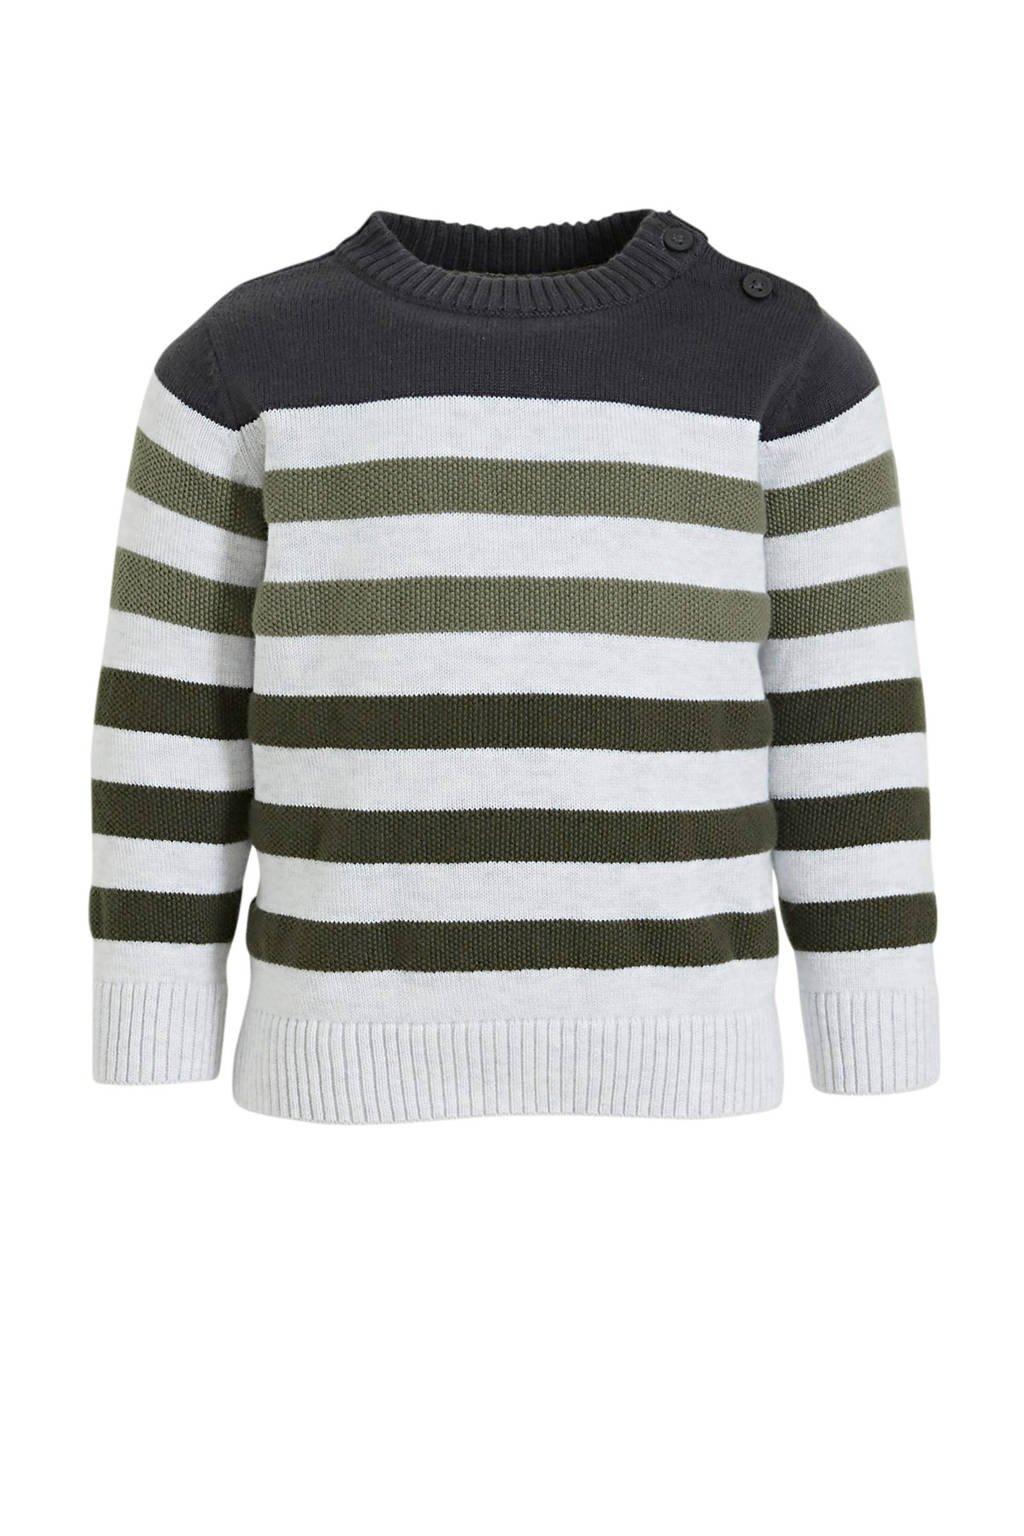 C&A Baby Club gestreepte trui donkergroen/lichtgrijs, Donkergroen/lichtgrijs